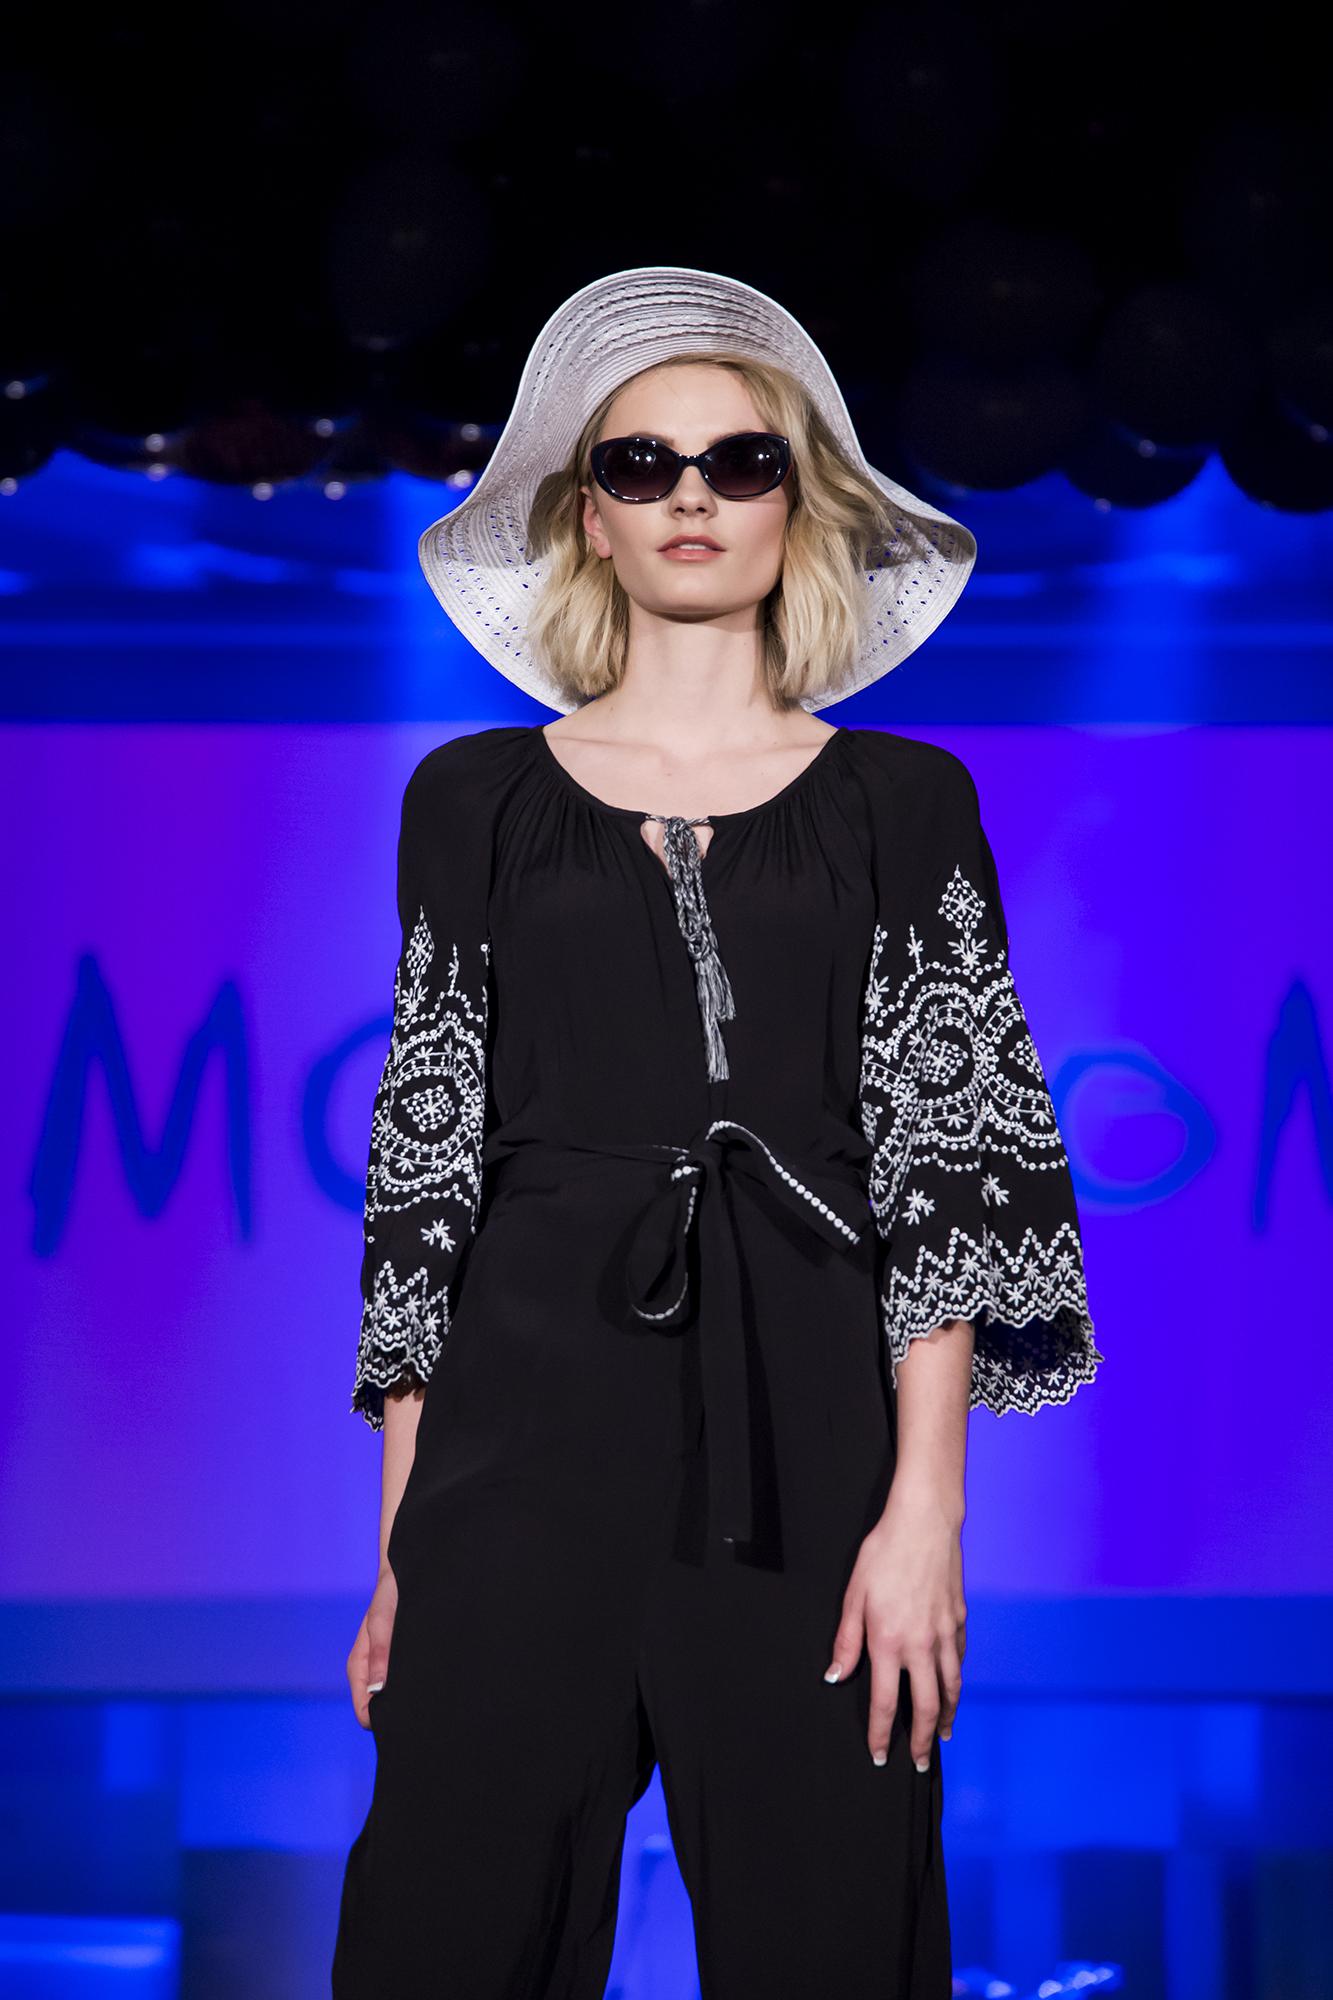 Fashion Excess_39.JPG